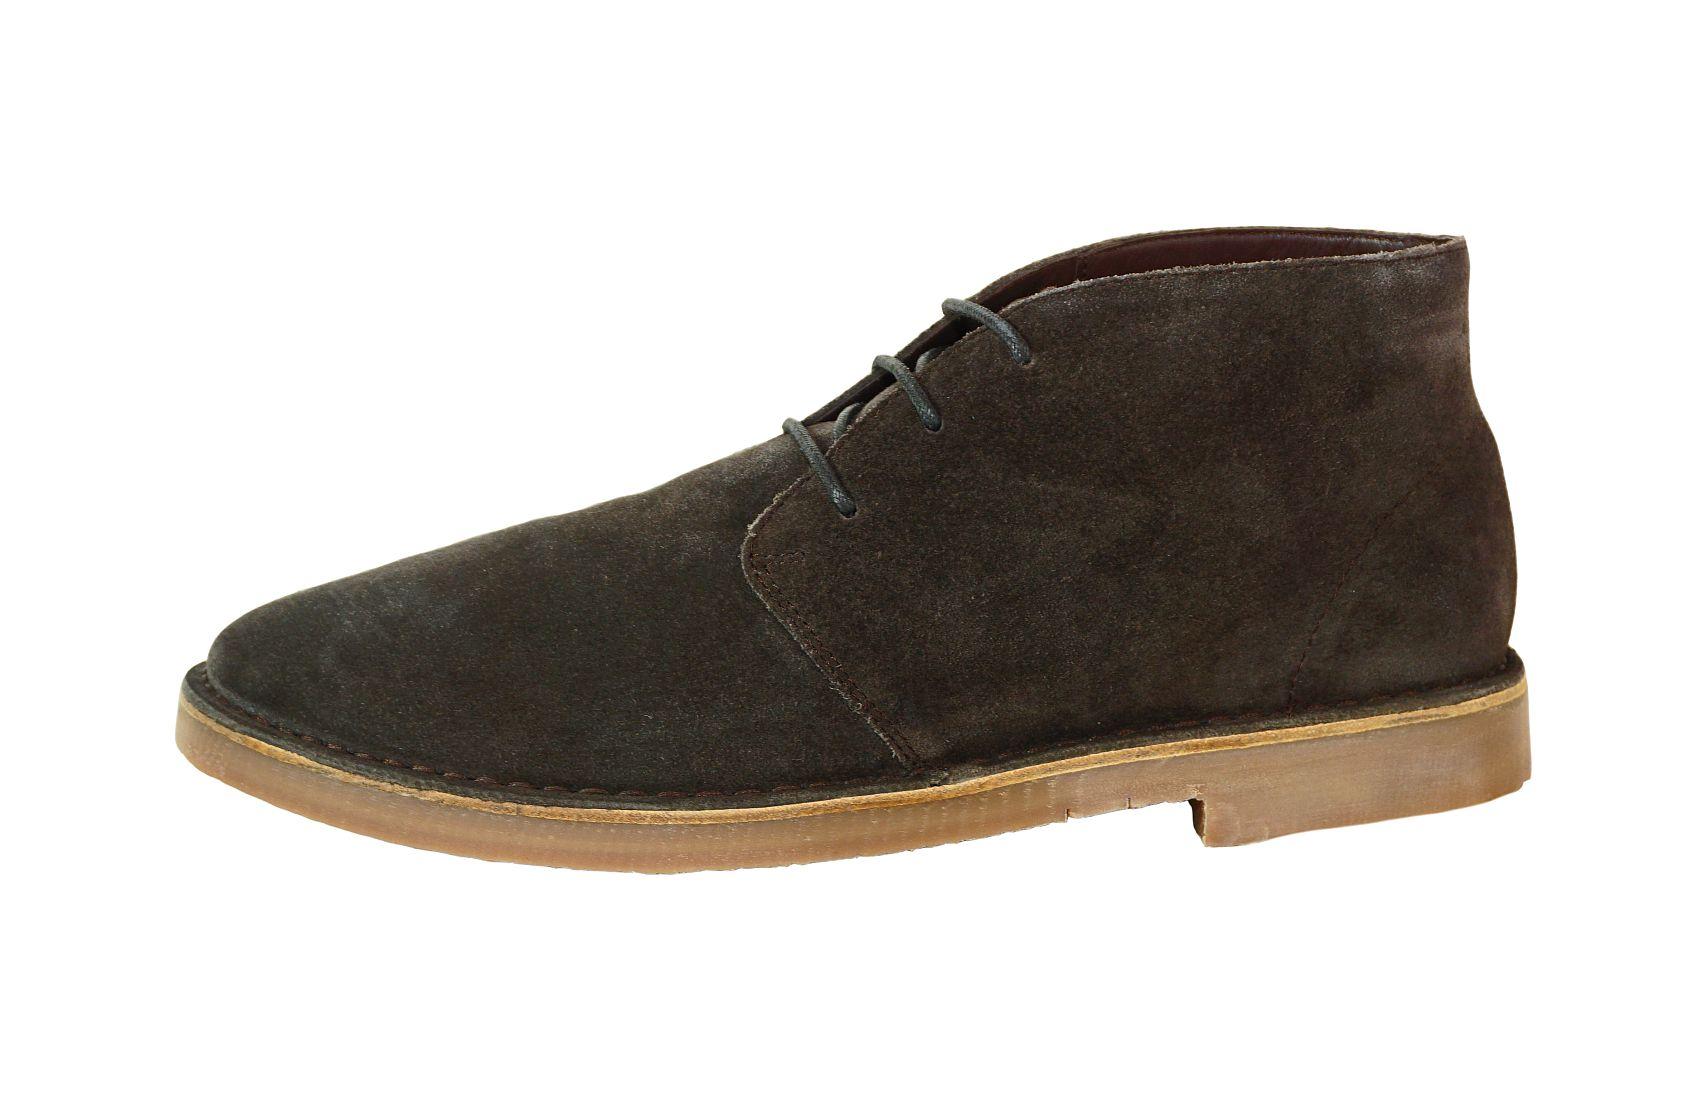 Armani Jeans Schuhe Stiefel Boot 935056 CC510 04552 brown after DA HW16-AJn